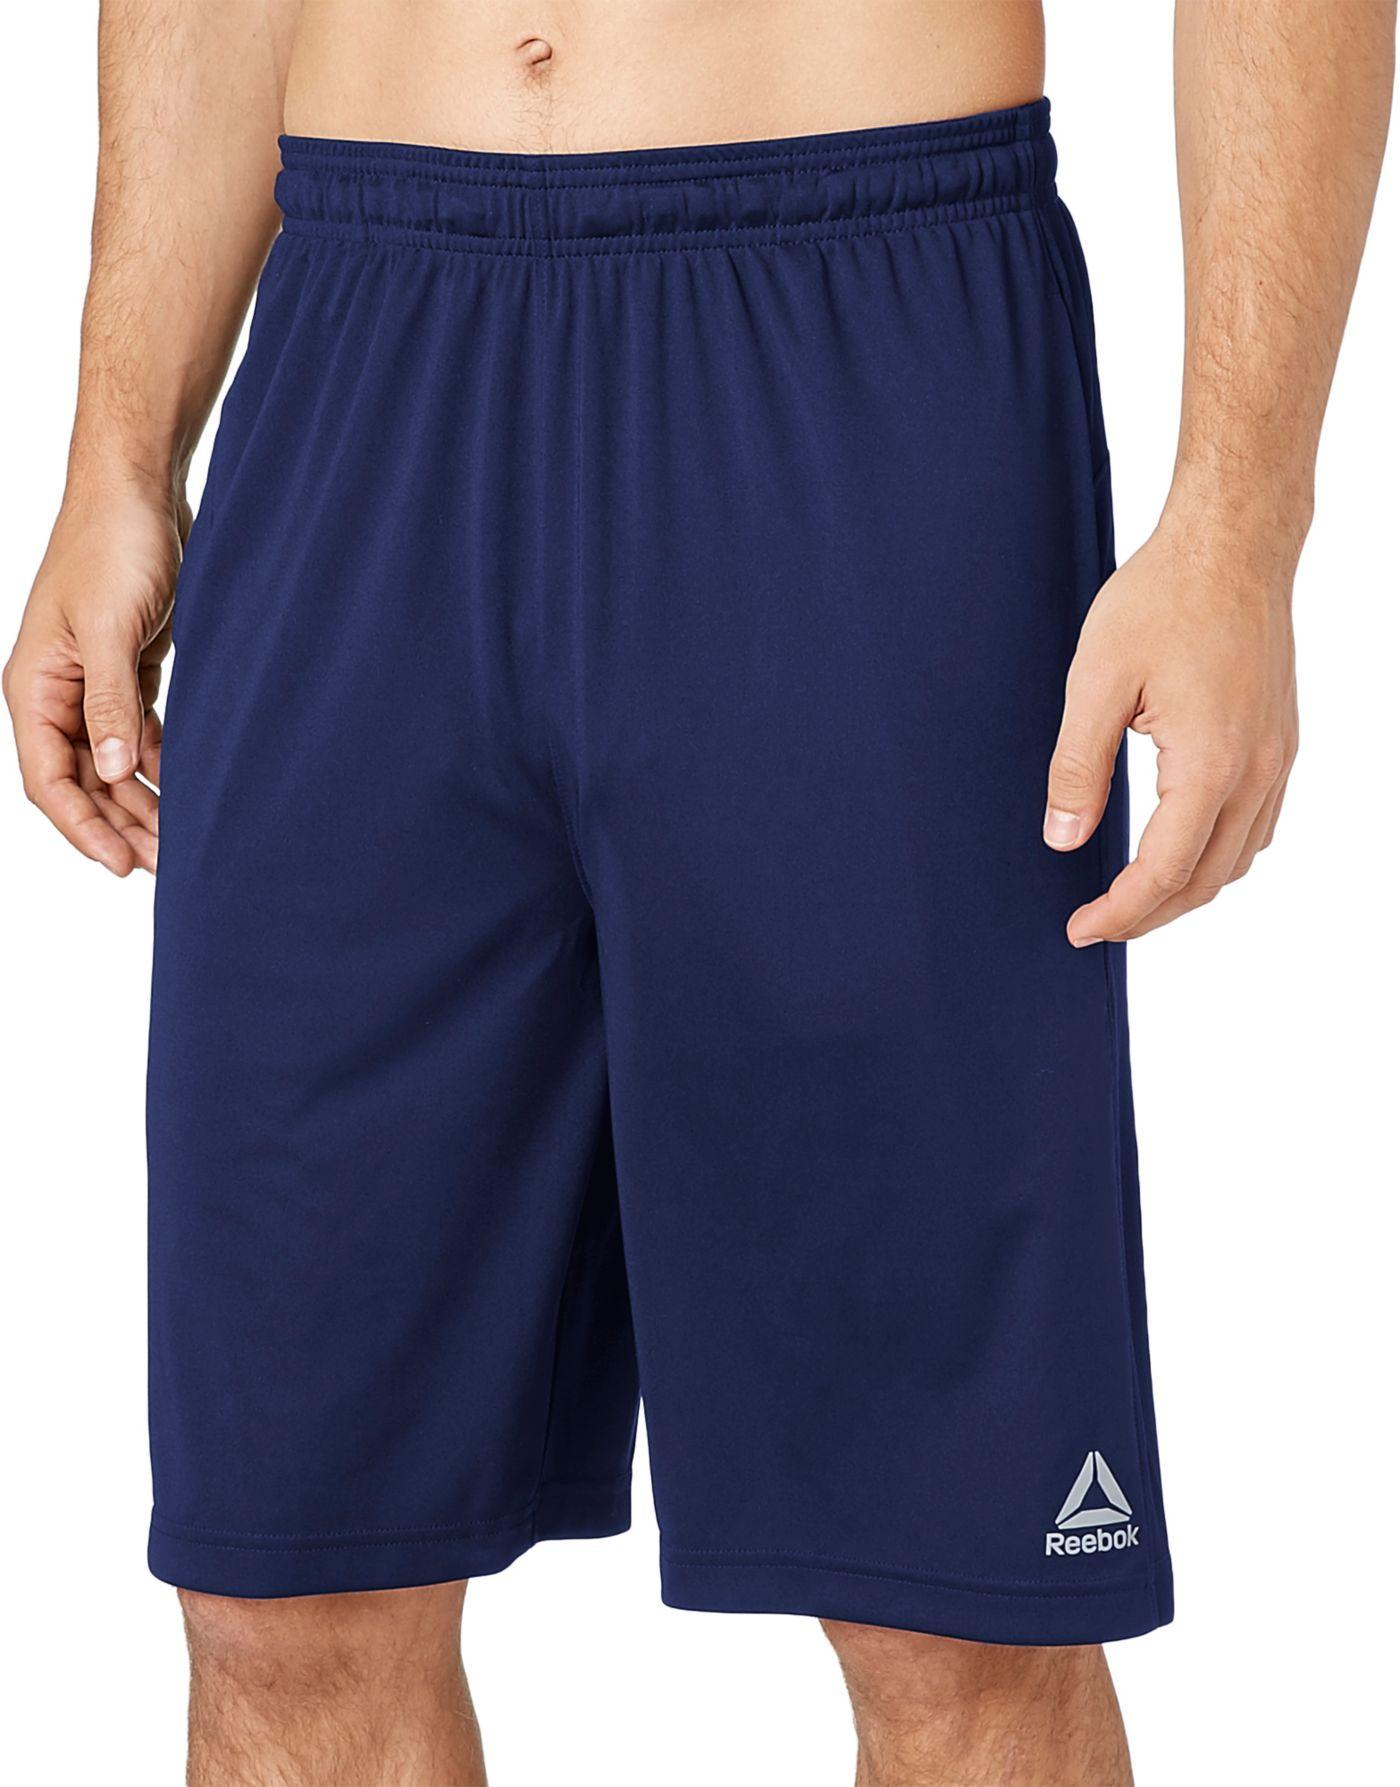 Reebok Men's Solid Performance Shorts